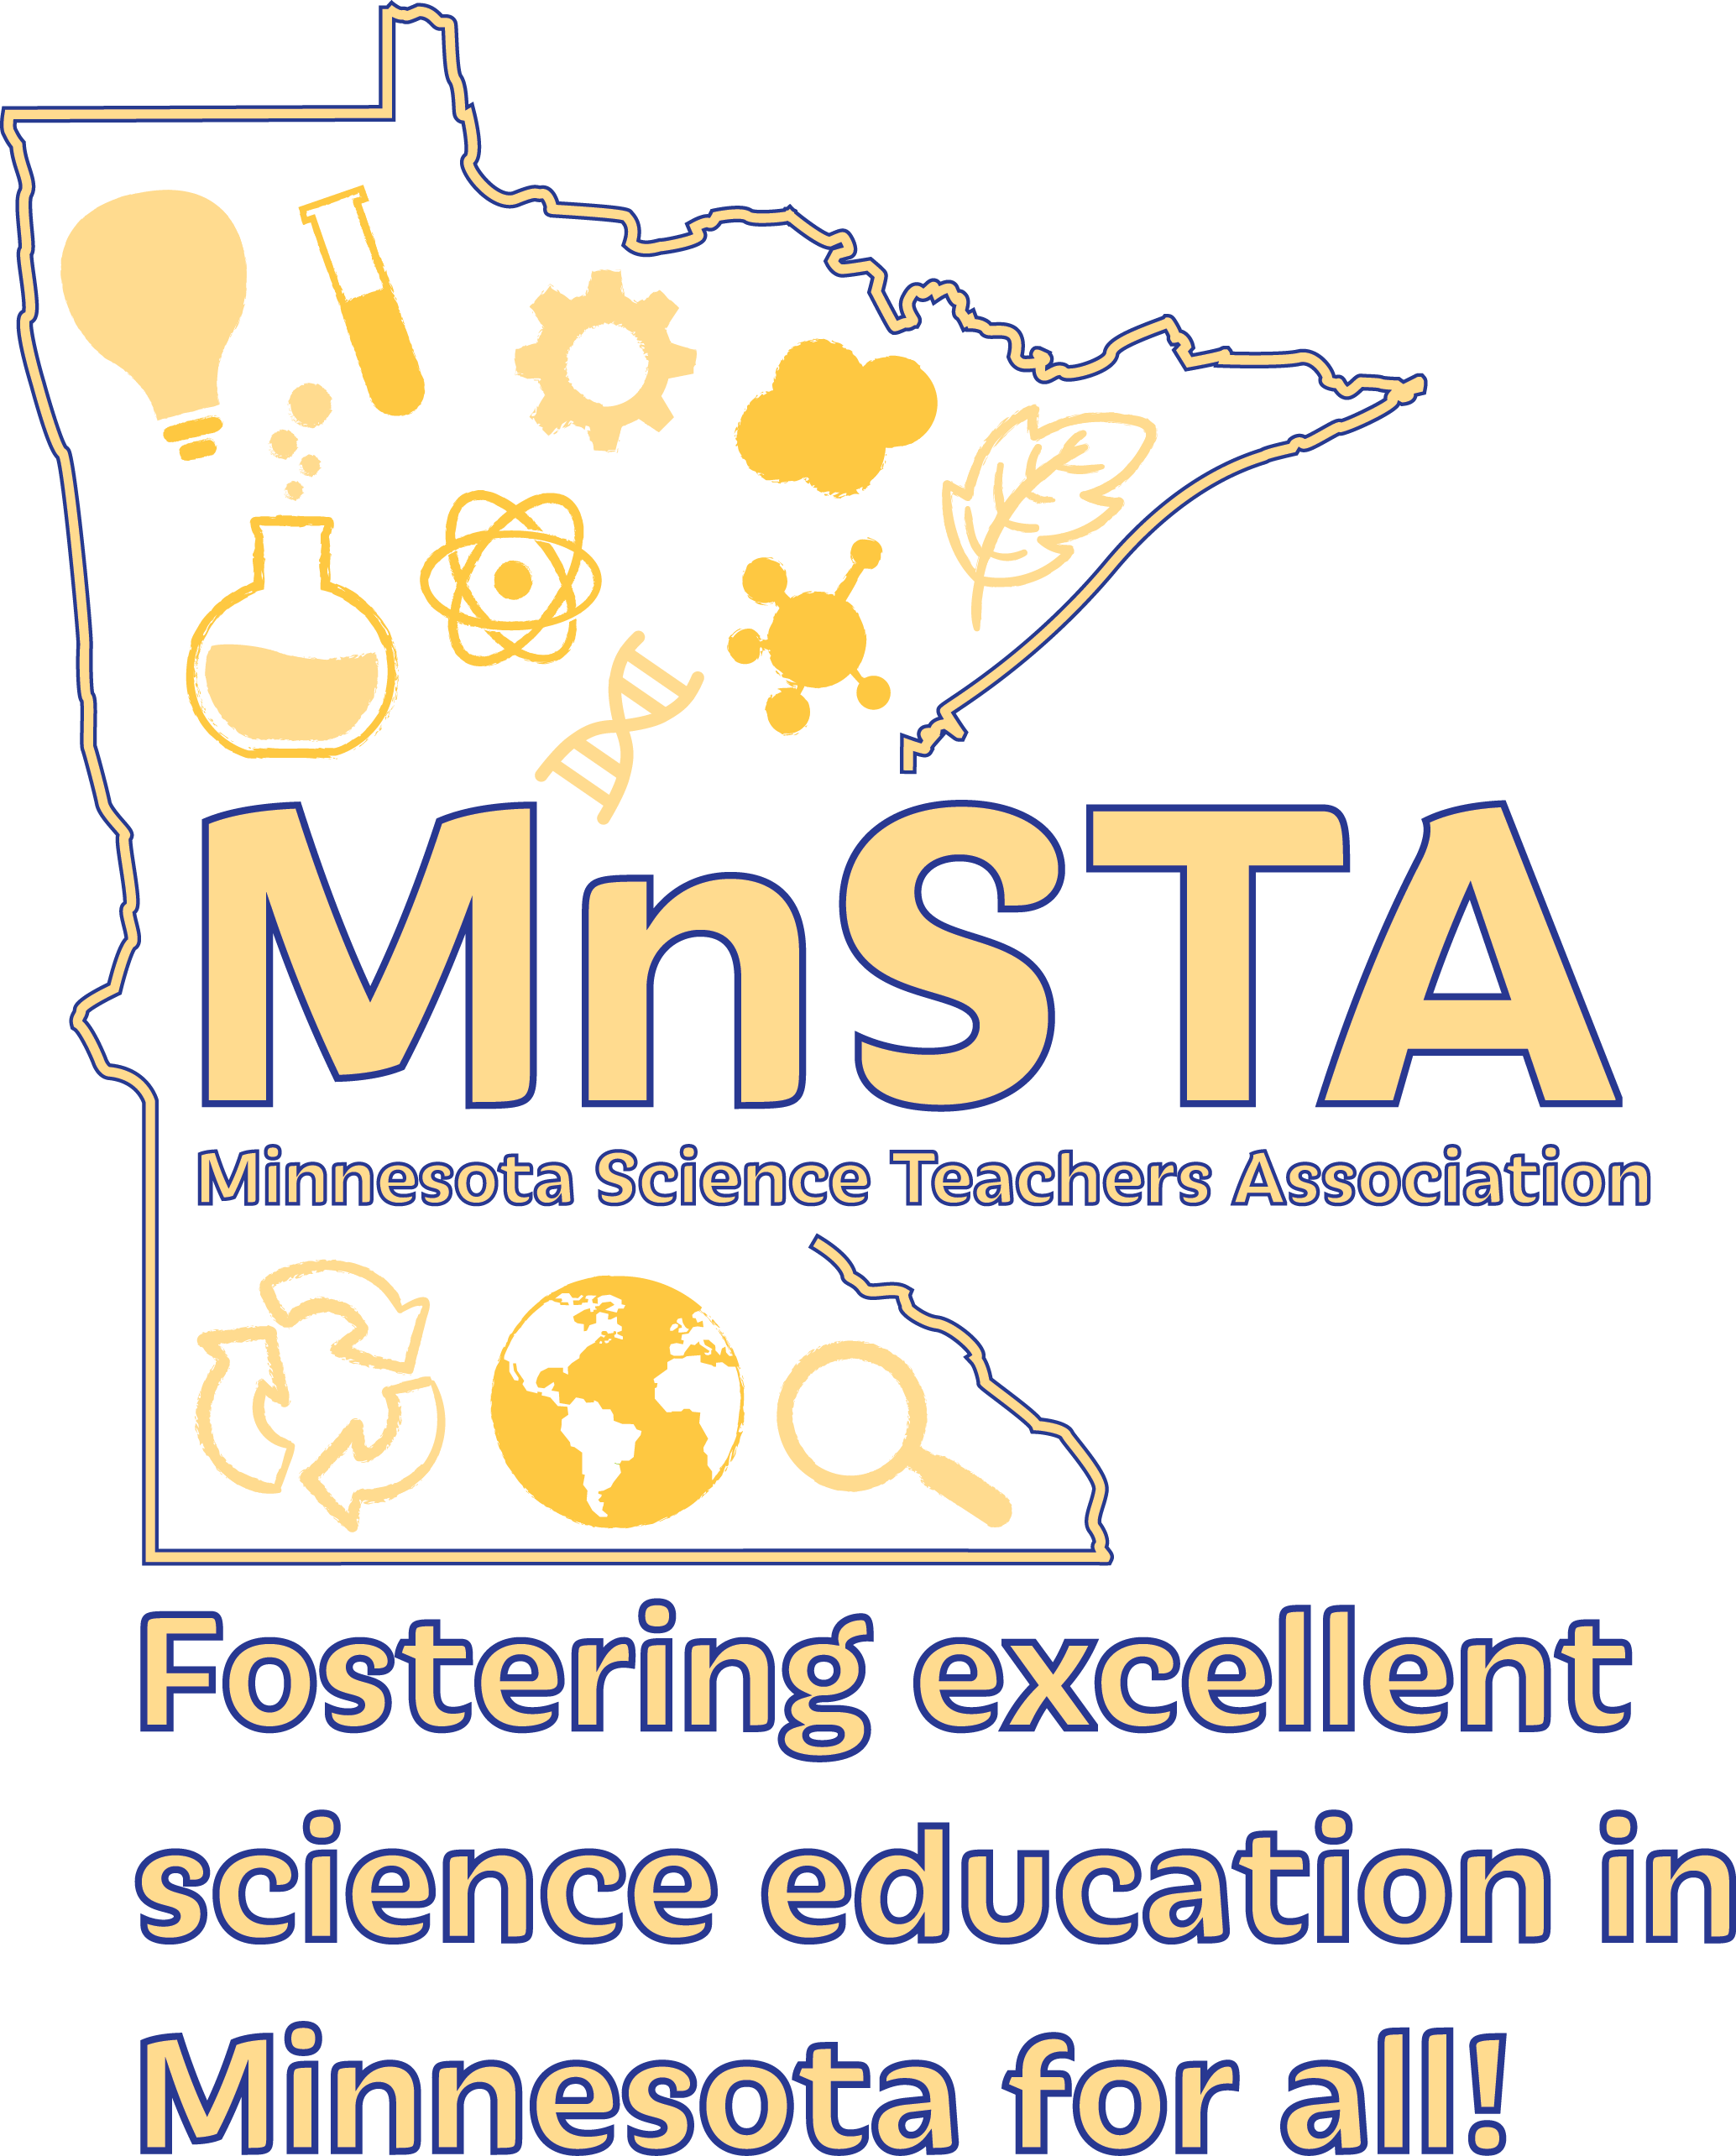 images/MnSTA Logo Theme